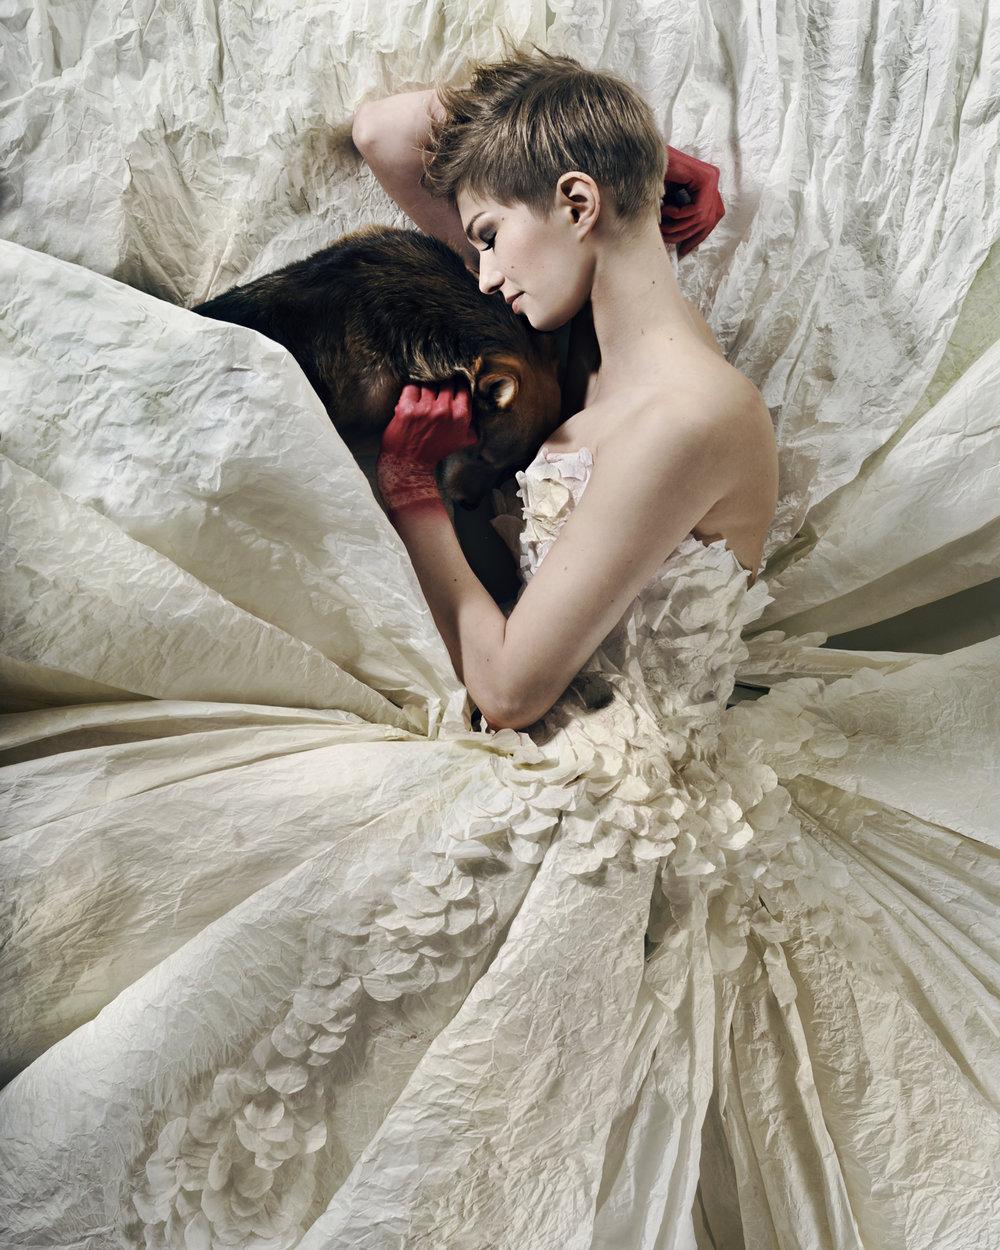 We're not so different, Paper.2012. Photographer Heli Hirvelä, Model Nanna Grundfeldt, Make up and hair Miia Magia.